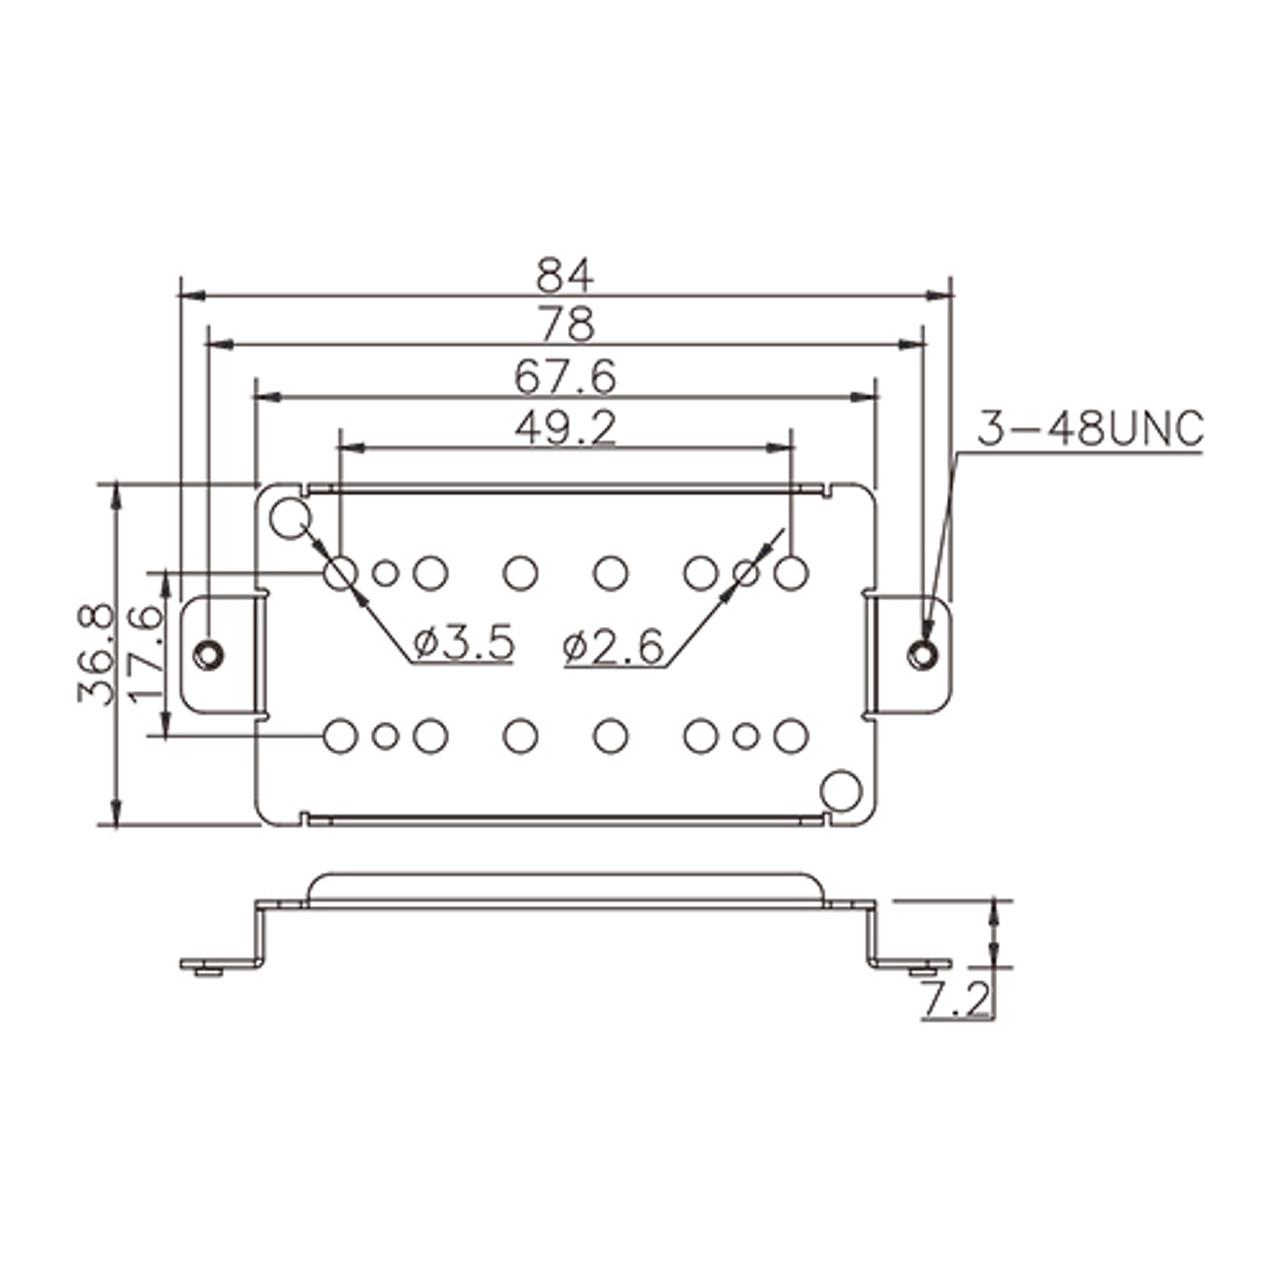 Pickup Baseplate - For Humbucker 49.2mm (nickel/silver)